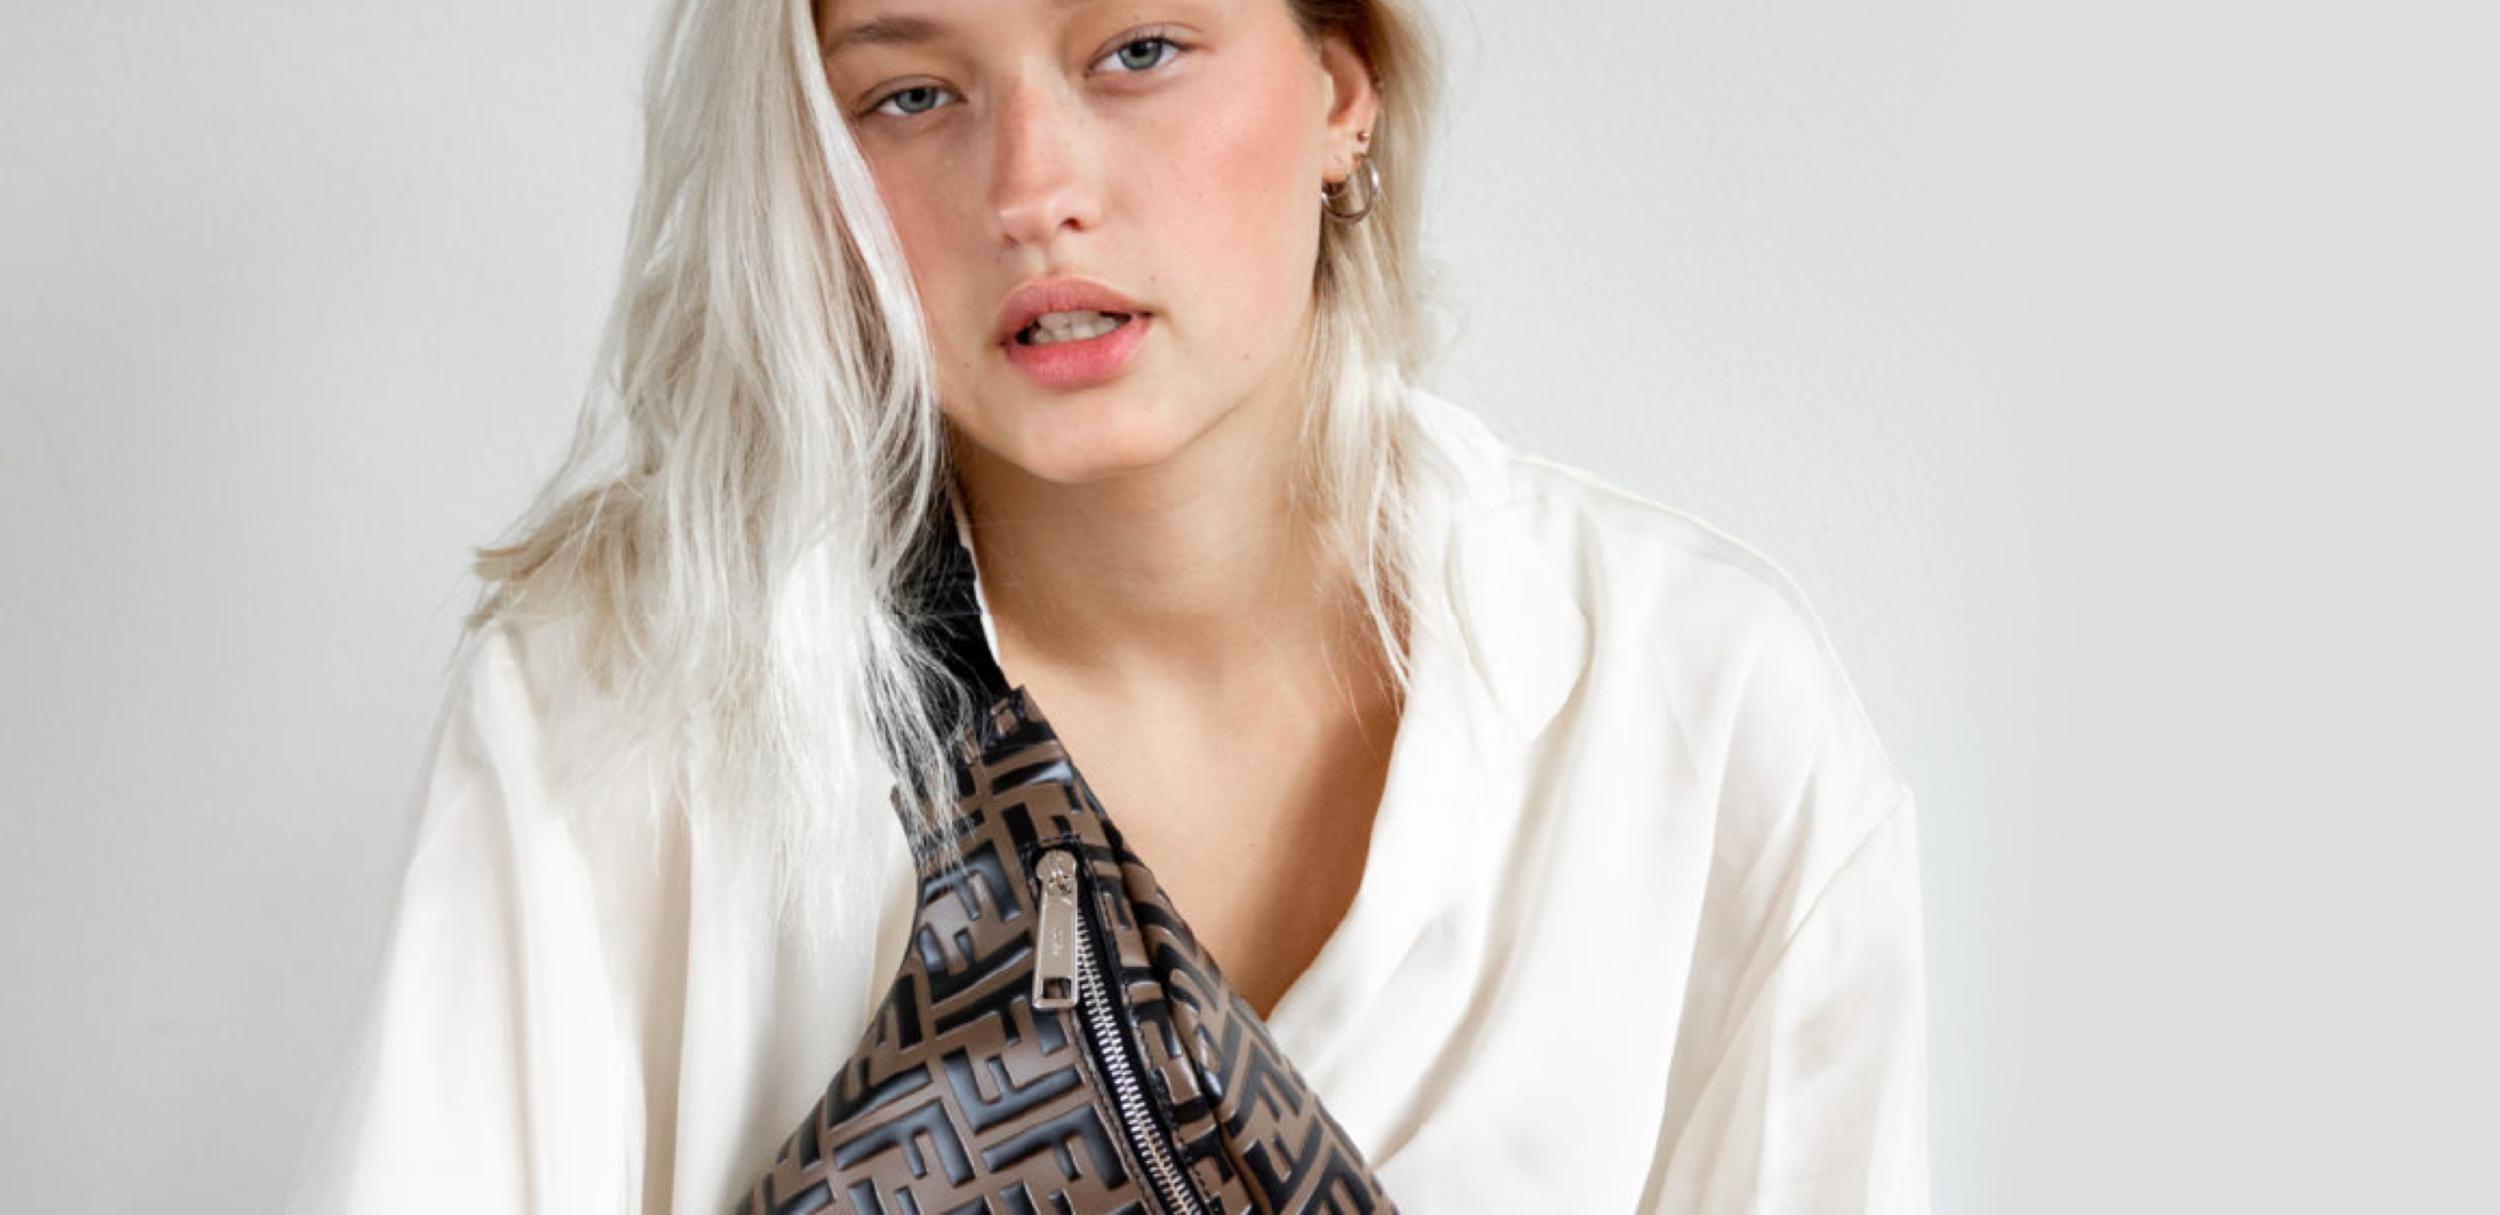 stockx-fashion-branding-5.png